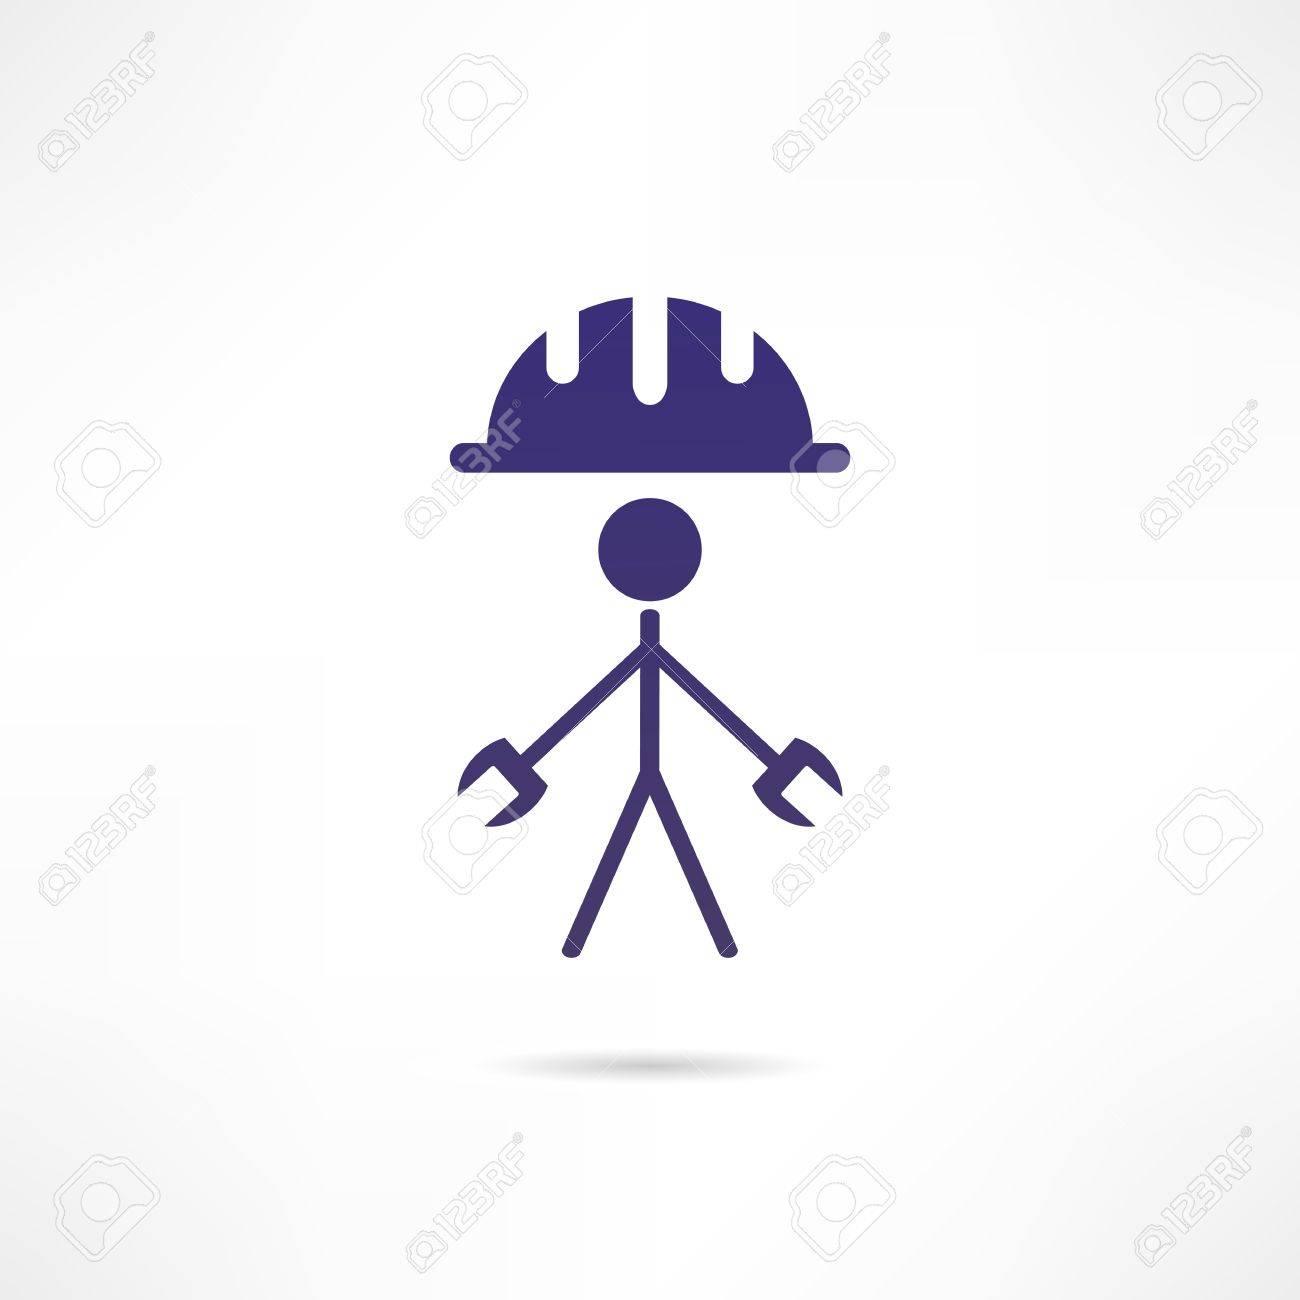 Engineer icon Stock Vector - 18244894